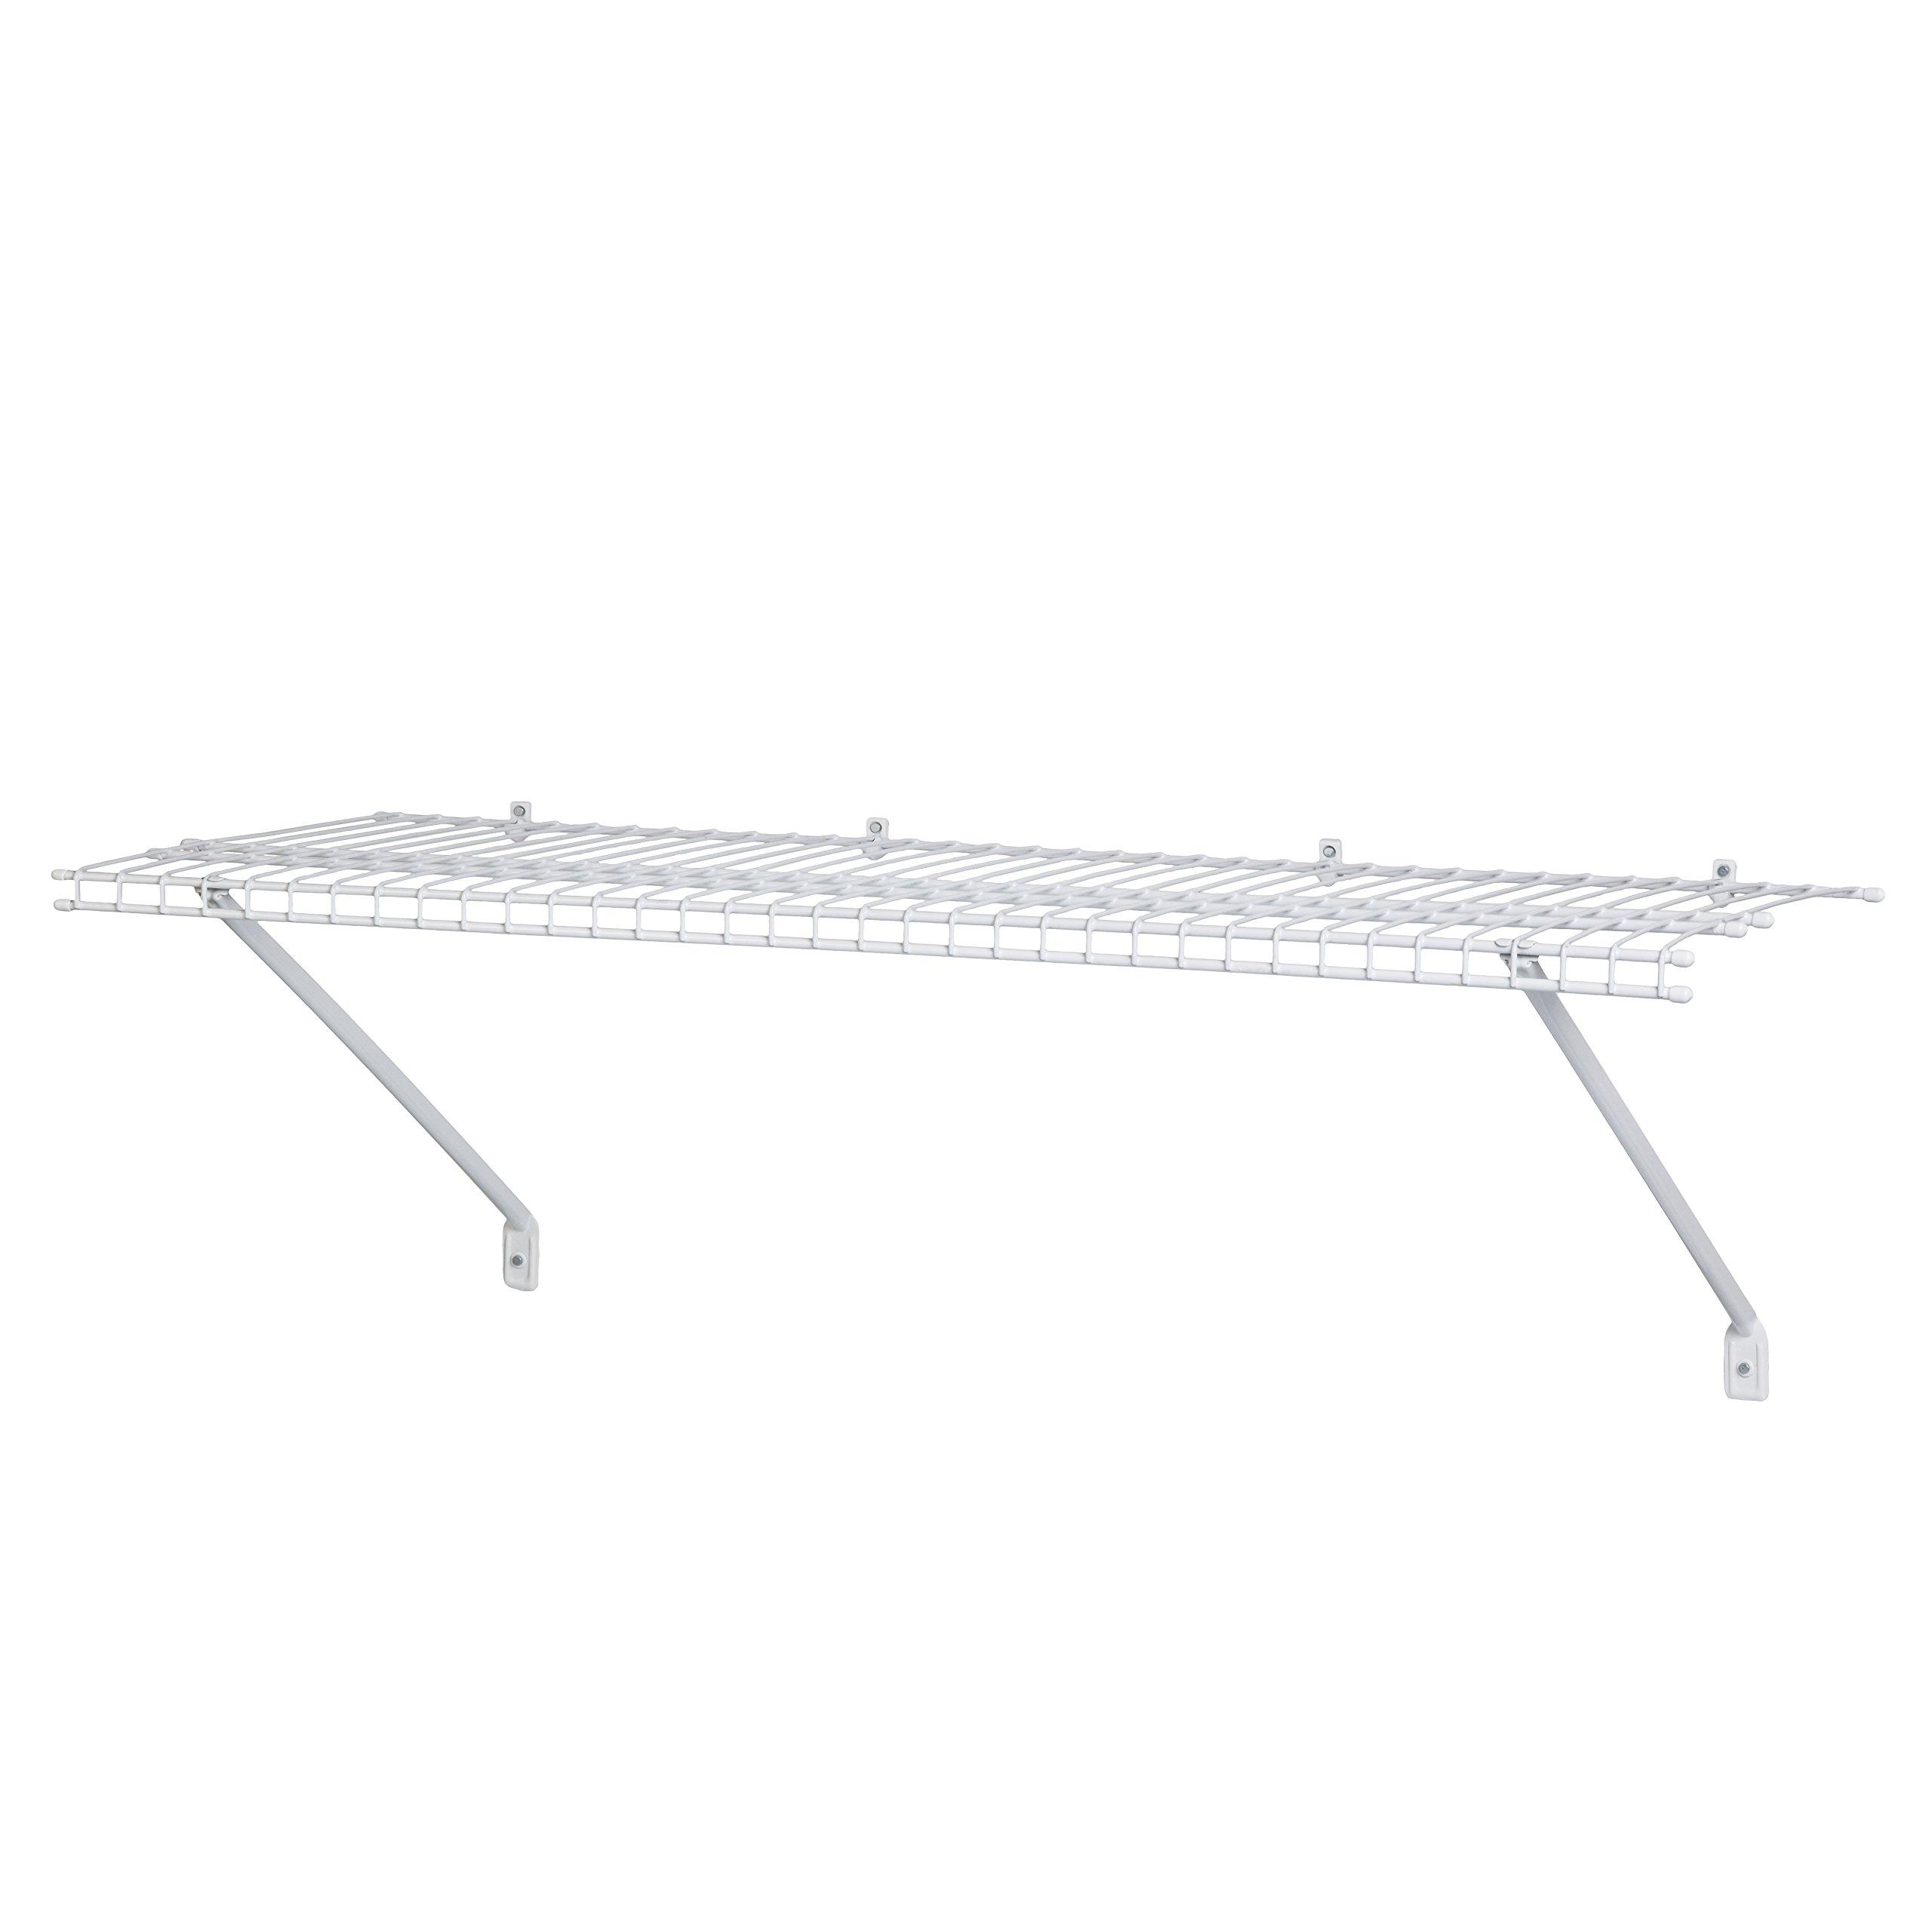 ClosetMaid 51031 Wire Shelf Kit, 3-Feet, White by ClosetMaid